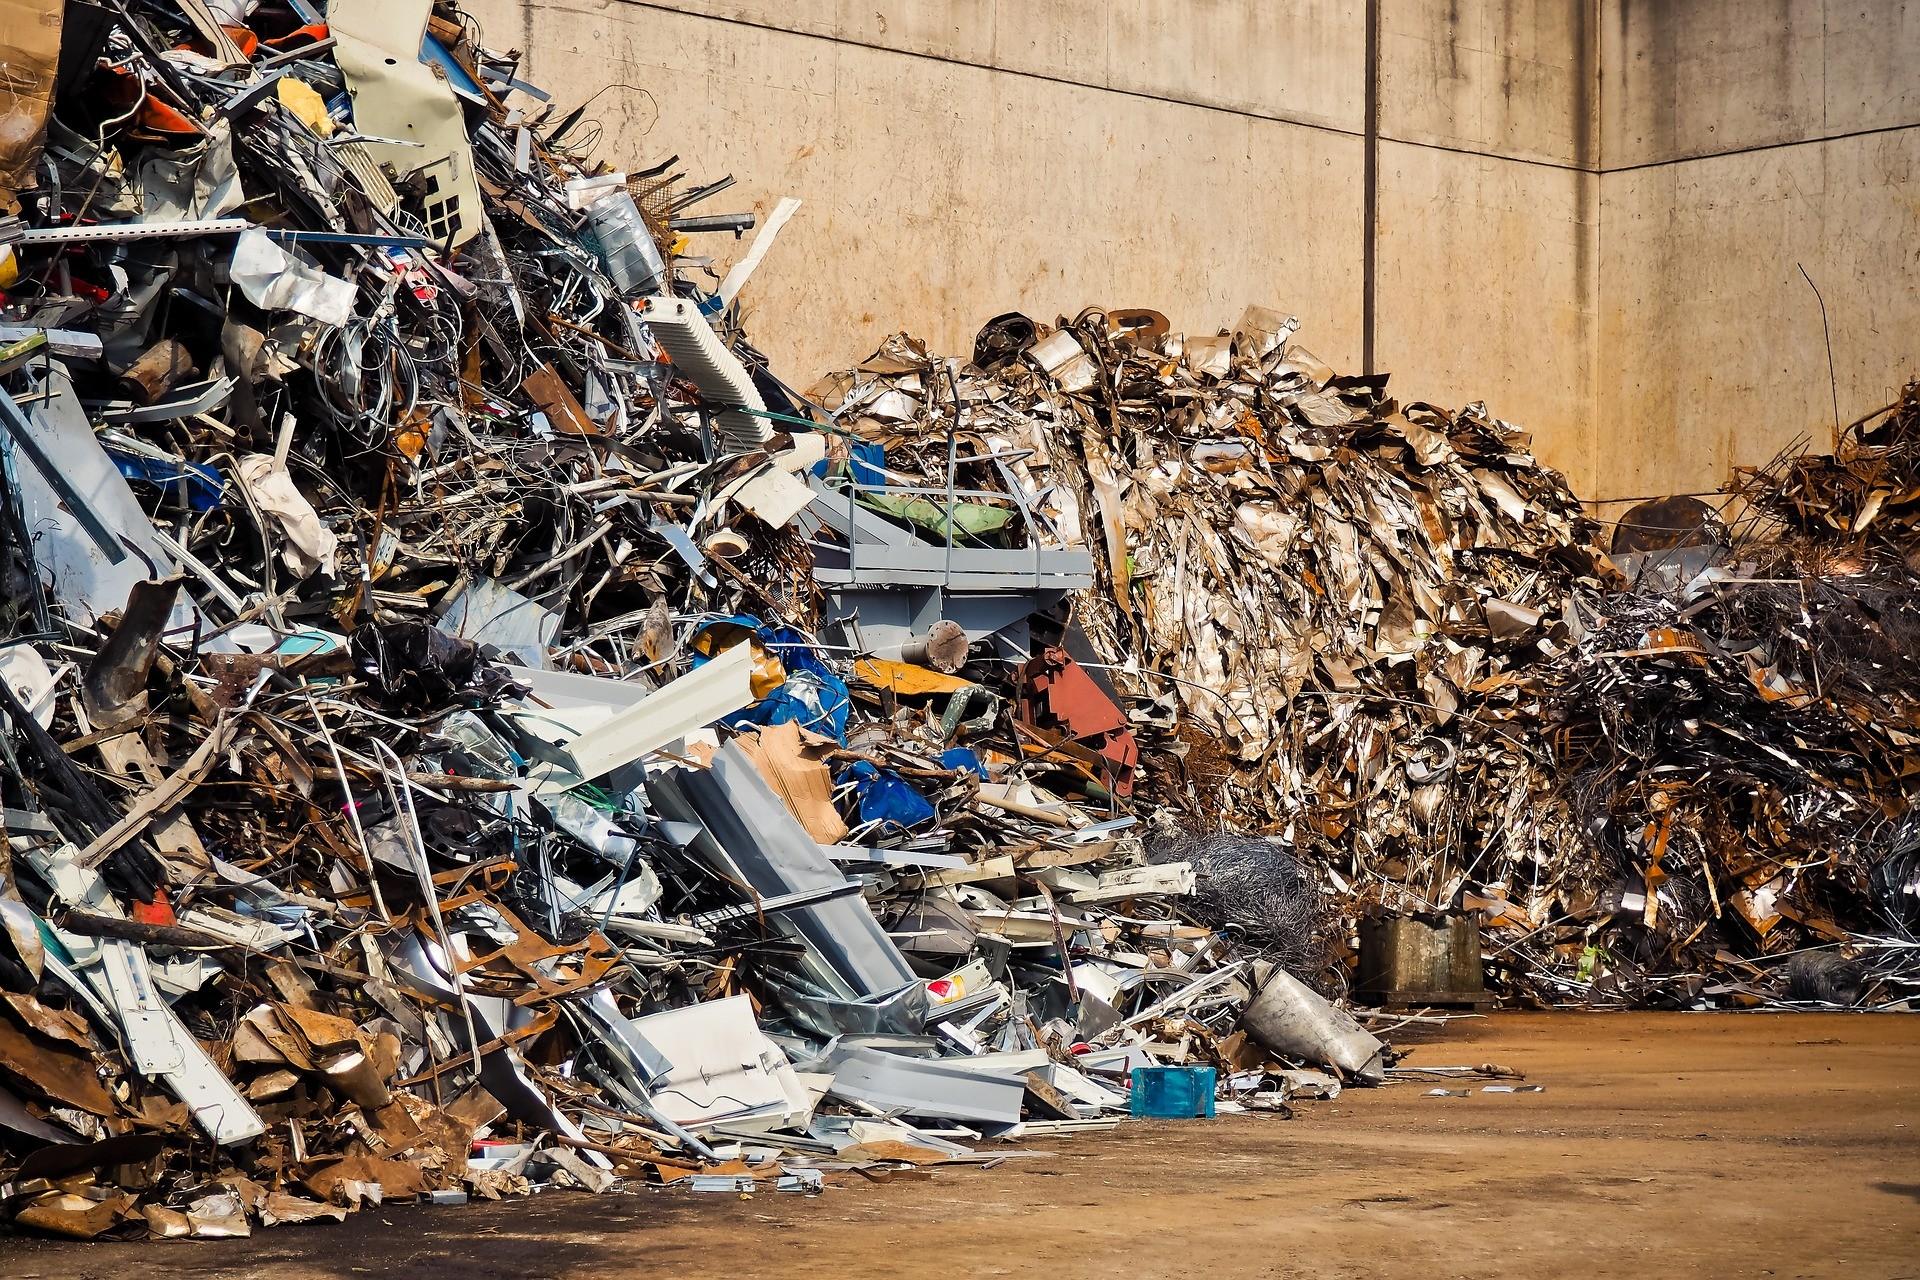 globalni_scitani_odpadu_kov_trideni_trideny_odpad